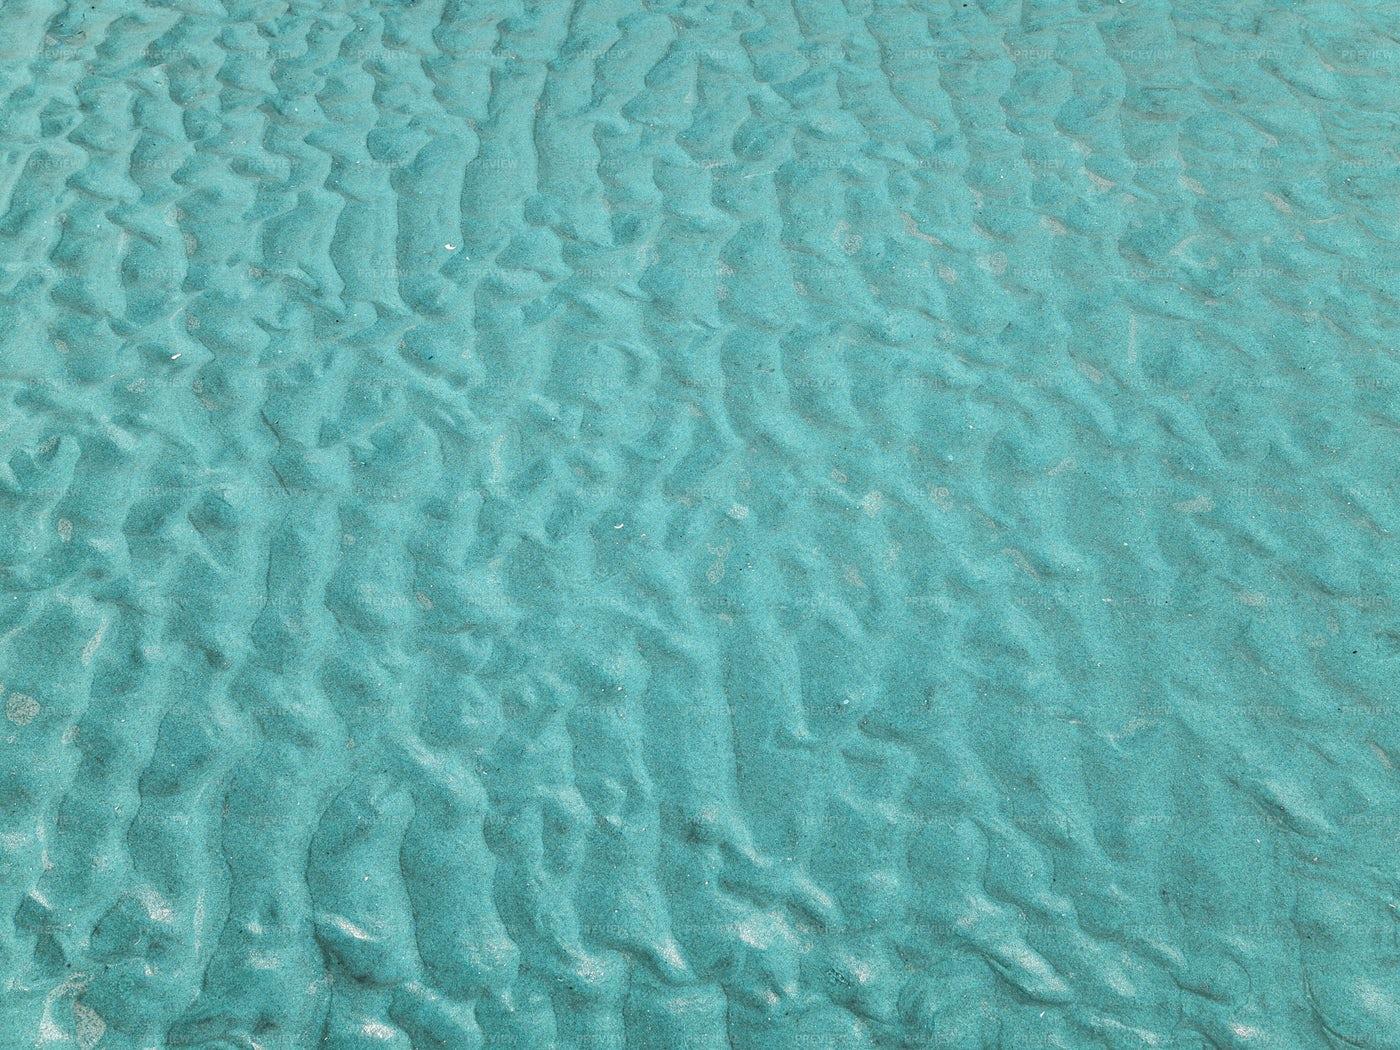 Sandy Ocean Floor: Stock Photos